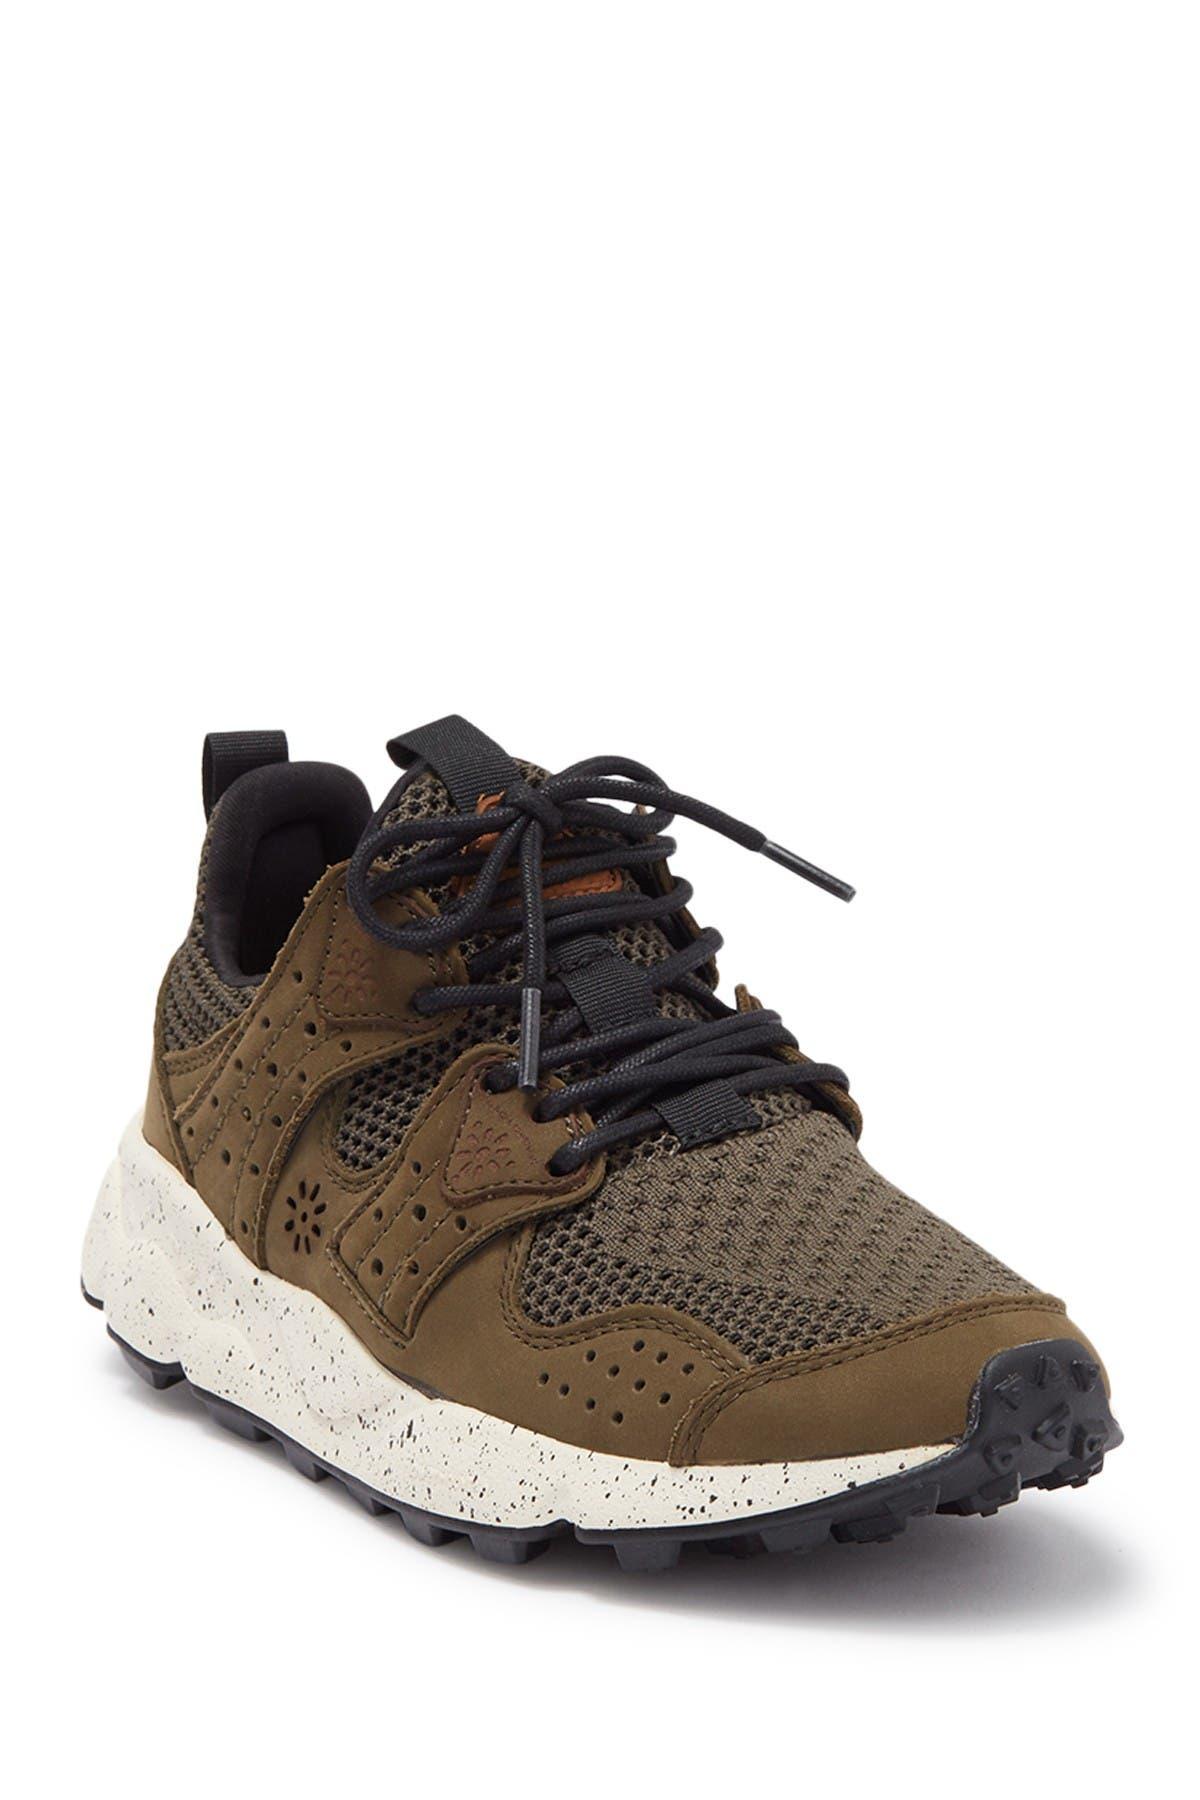 Image of Flower Mountain Corax Sneaker